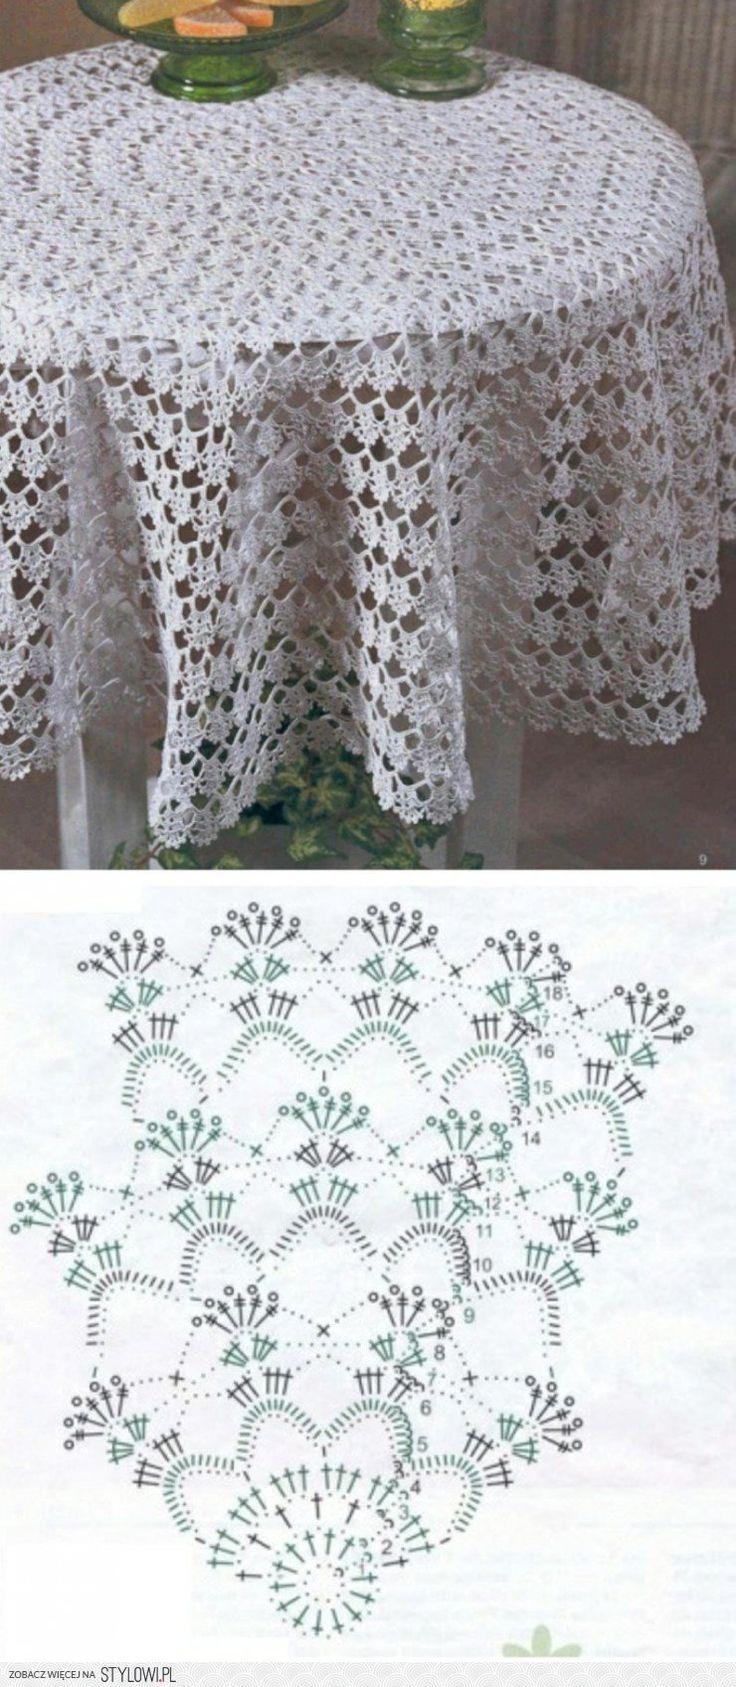 [] #<br/> # #Crochet #Home,<br/> # #Crochet #Kitchen,<br/> # #Crochet #Tablecloth,<br/> # #Crochet #Doilies,<br/> # #Crochet #Accessories,<br/> # #Crochet #Patterns,<br/> # #Mantel #Redondo,<br/> # #Nelly,<br/> # #Marian<br/>